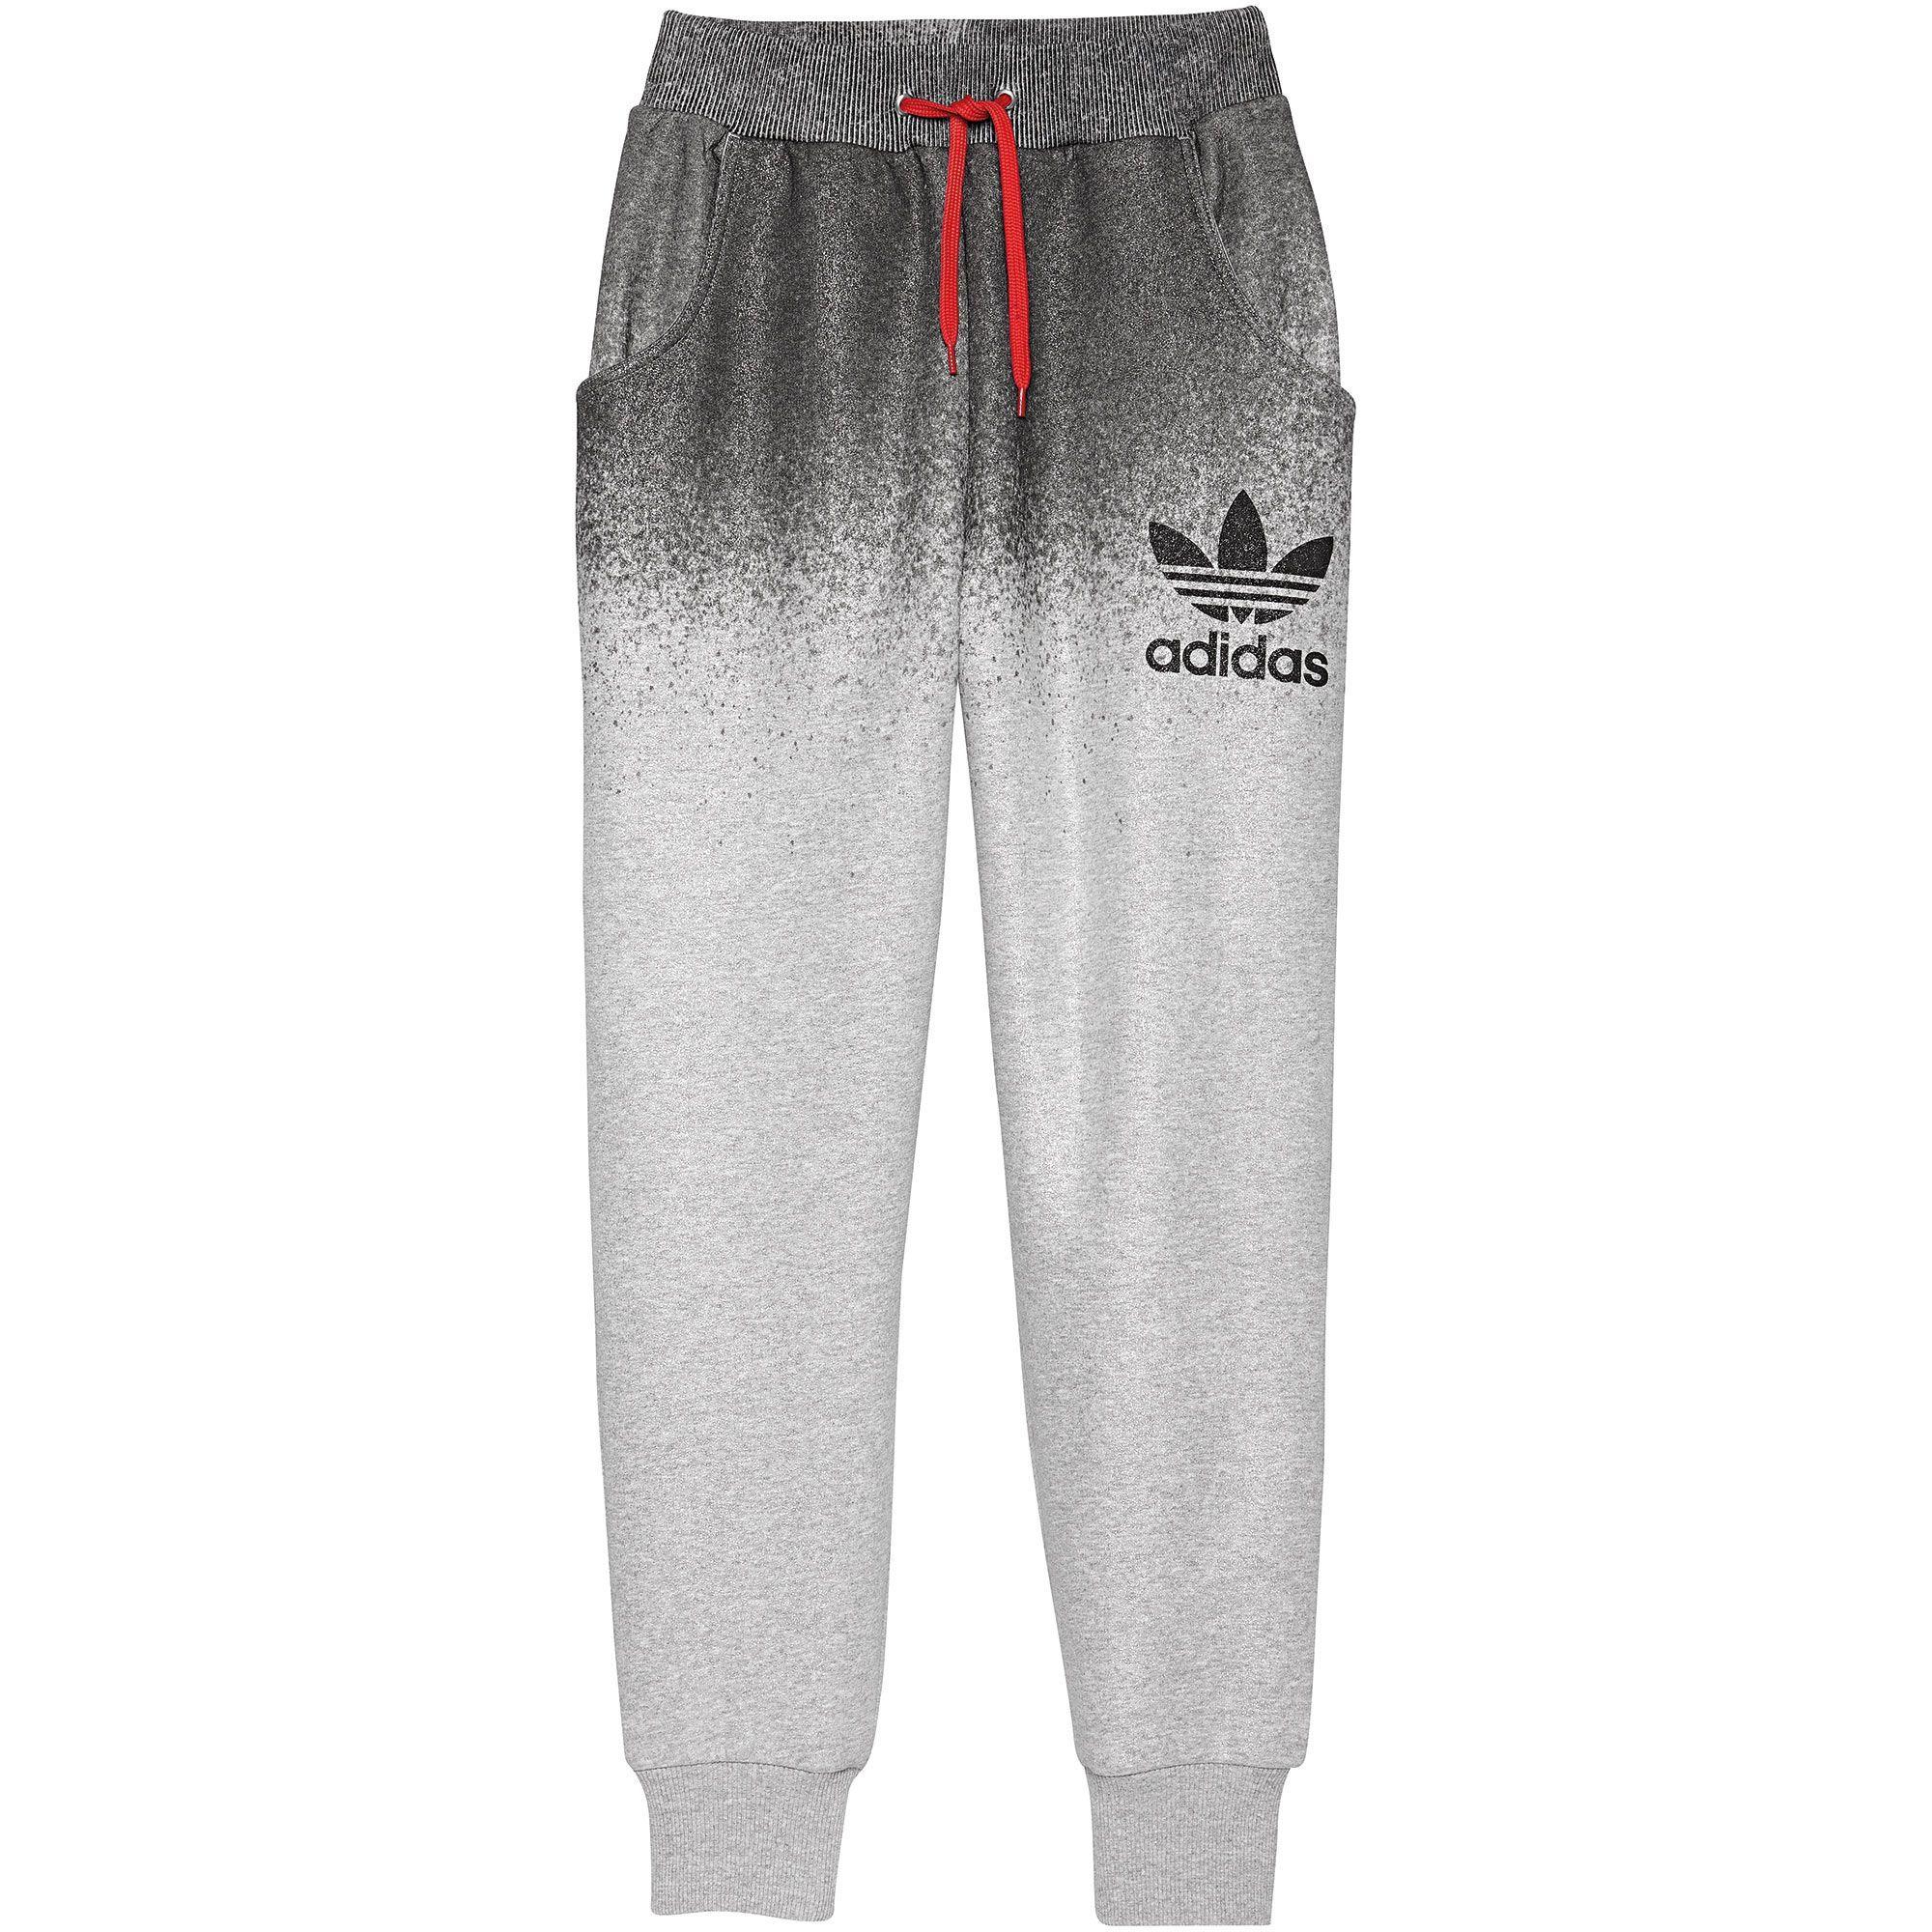 5e36f16bca143 adidas - Loose Pants